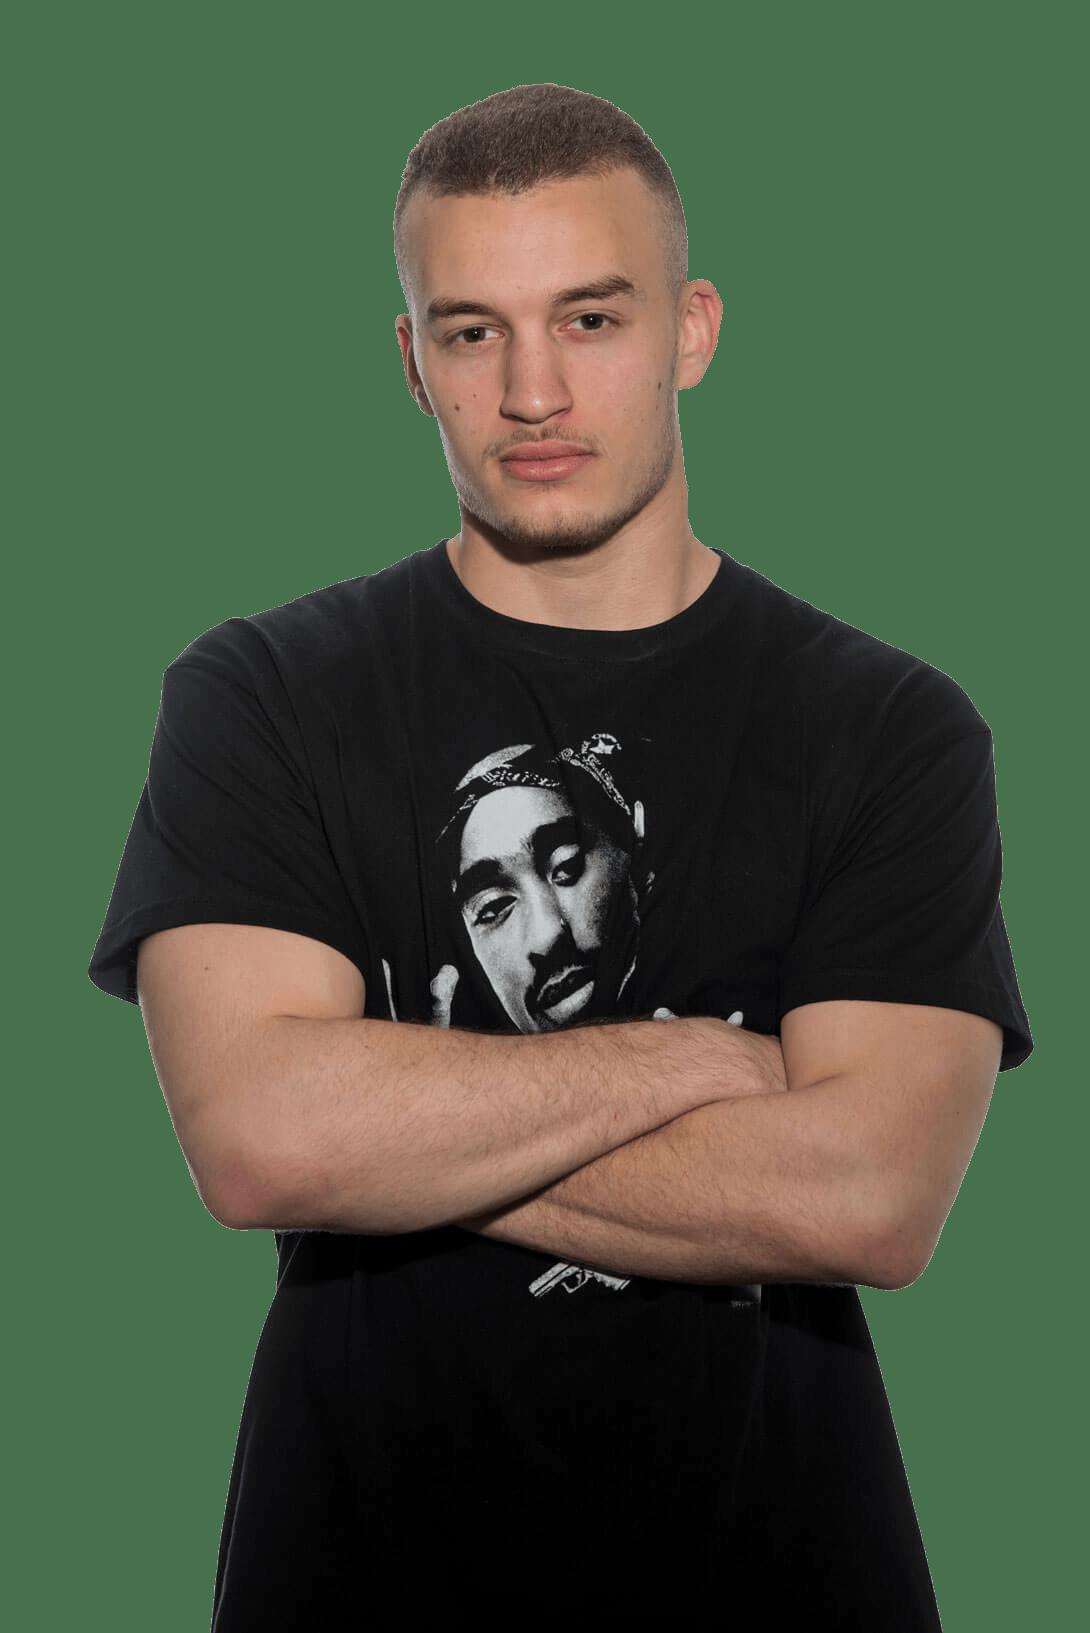 DJ-Fido-Stade-Person-verschraenkte-Arme